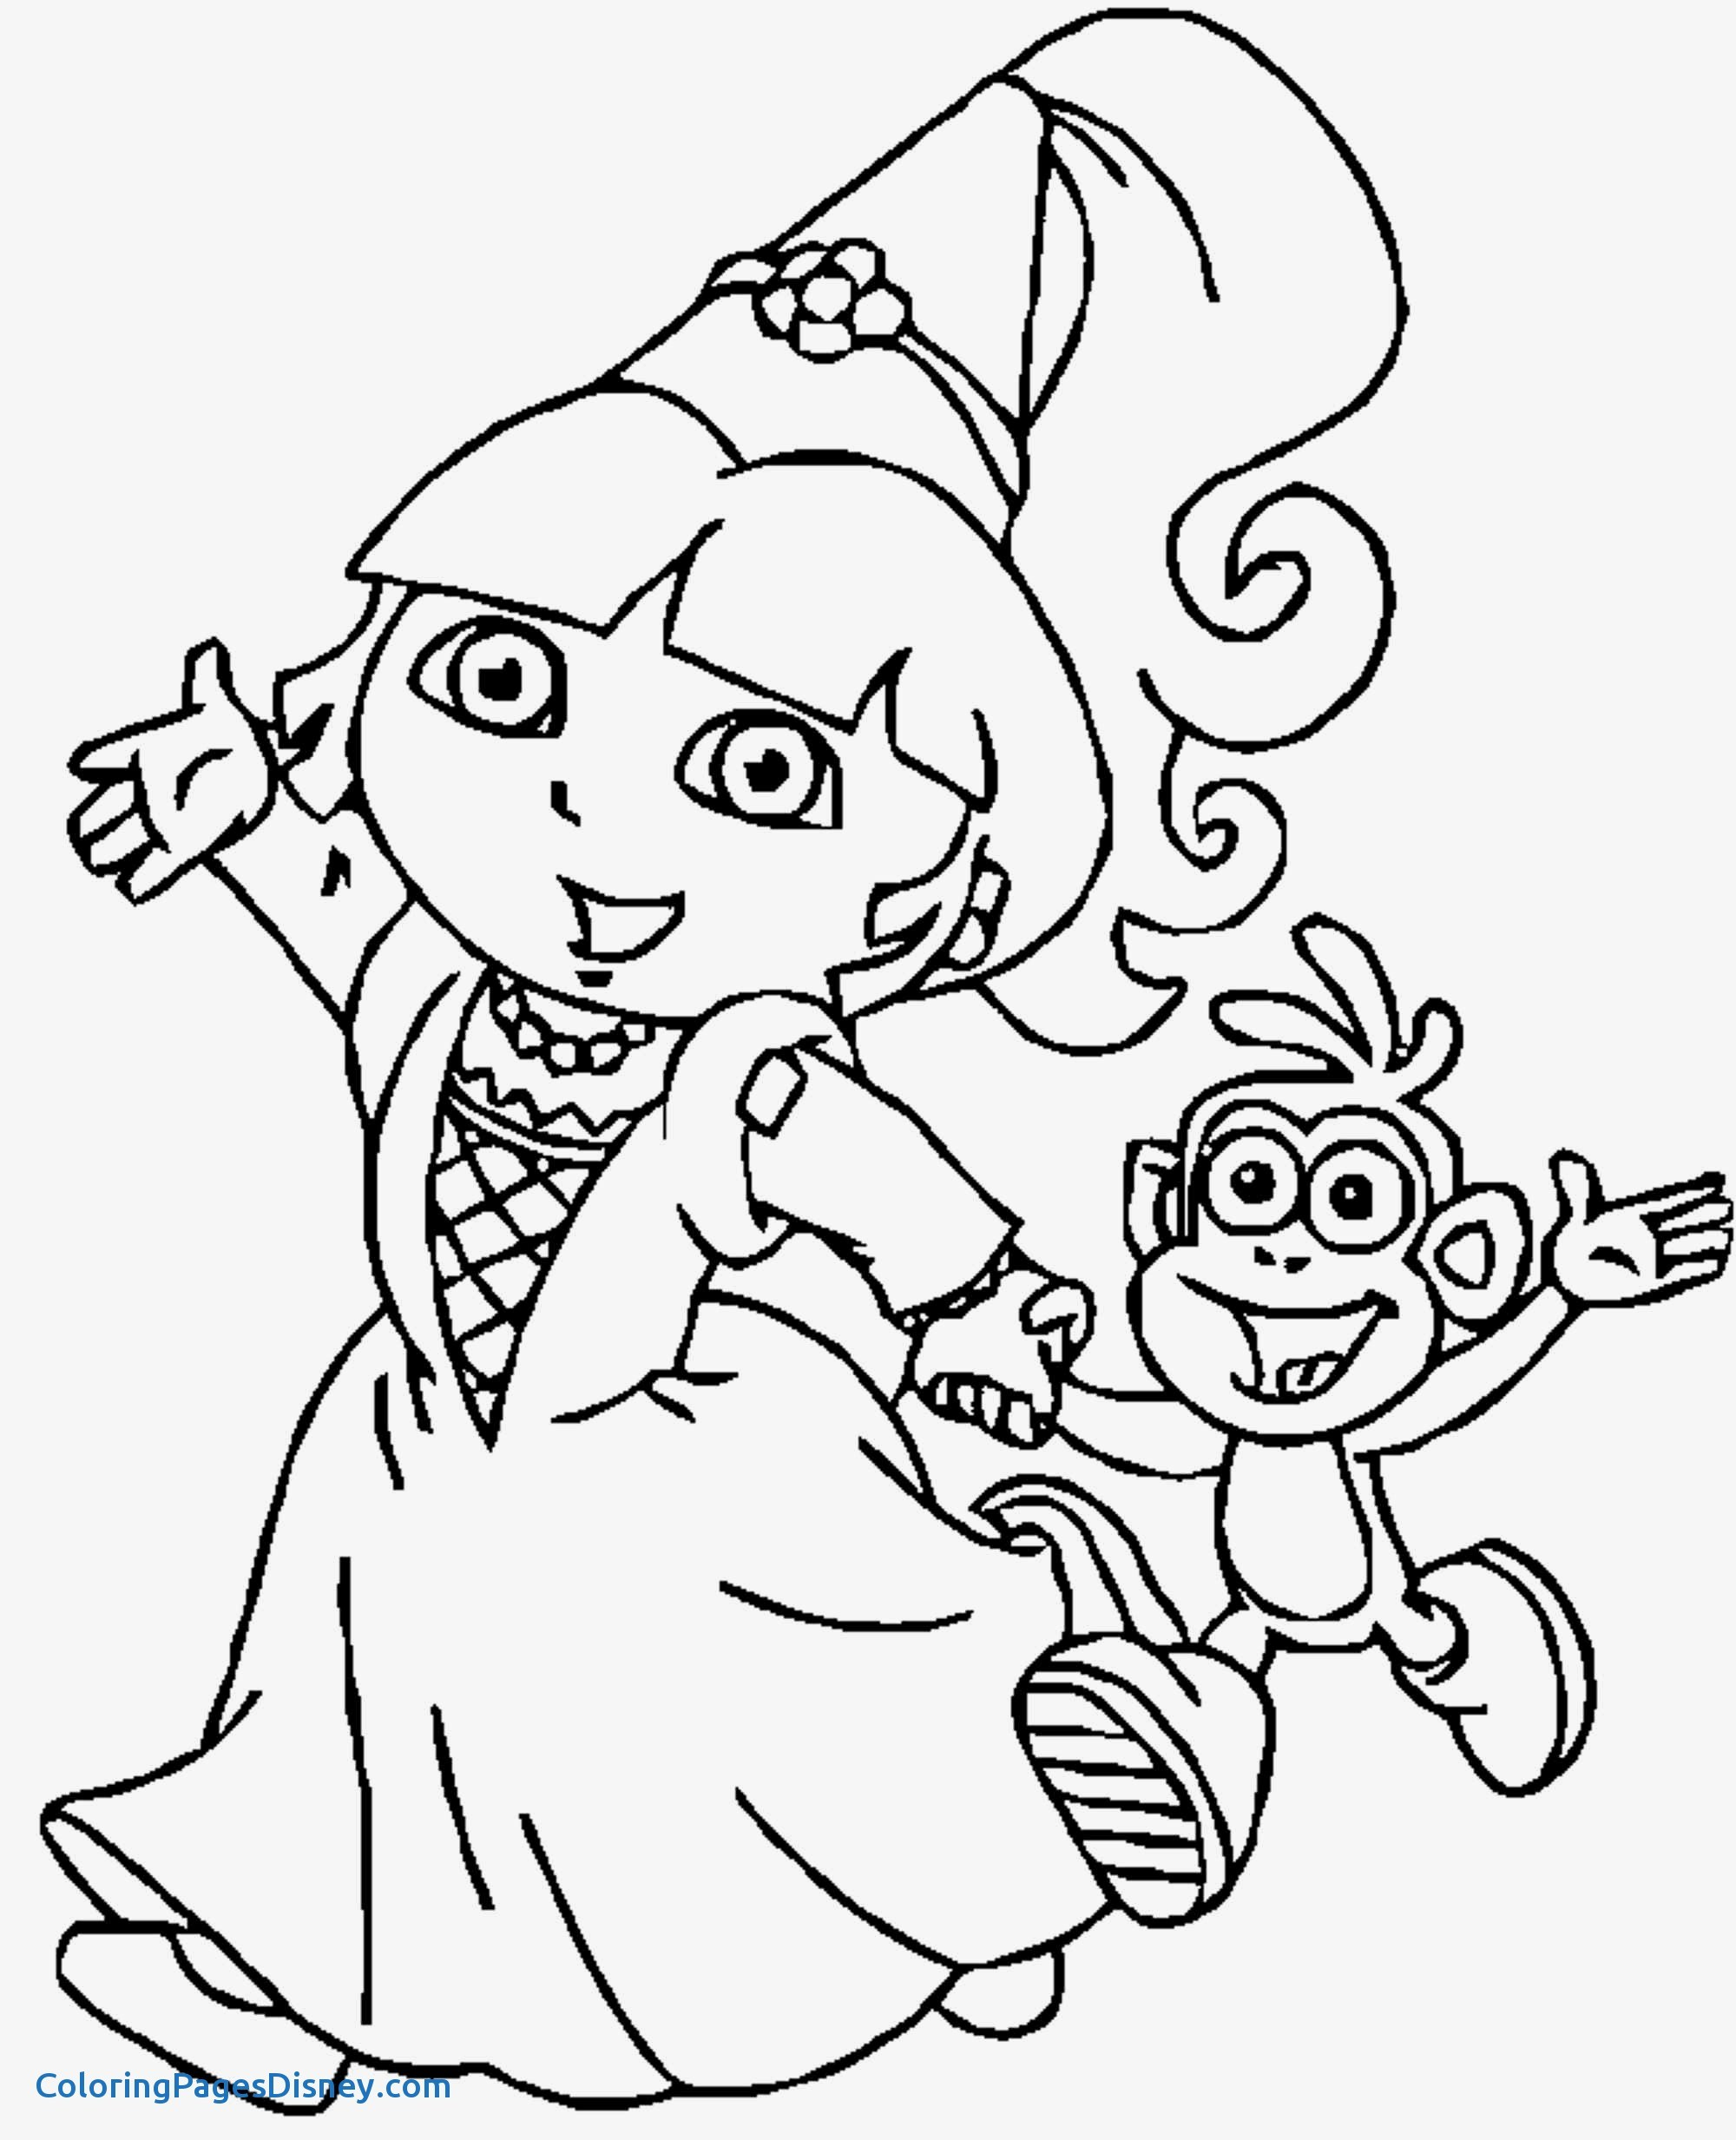 2000x2465 Dora The Explorer Coloring Pages Awesome Simple Dora Princess